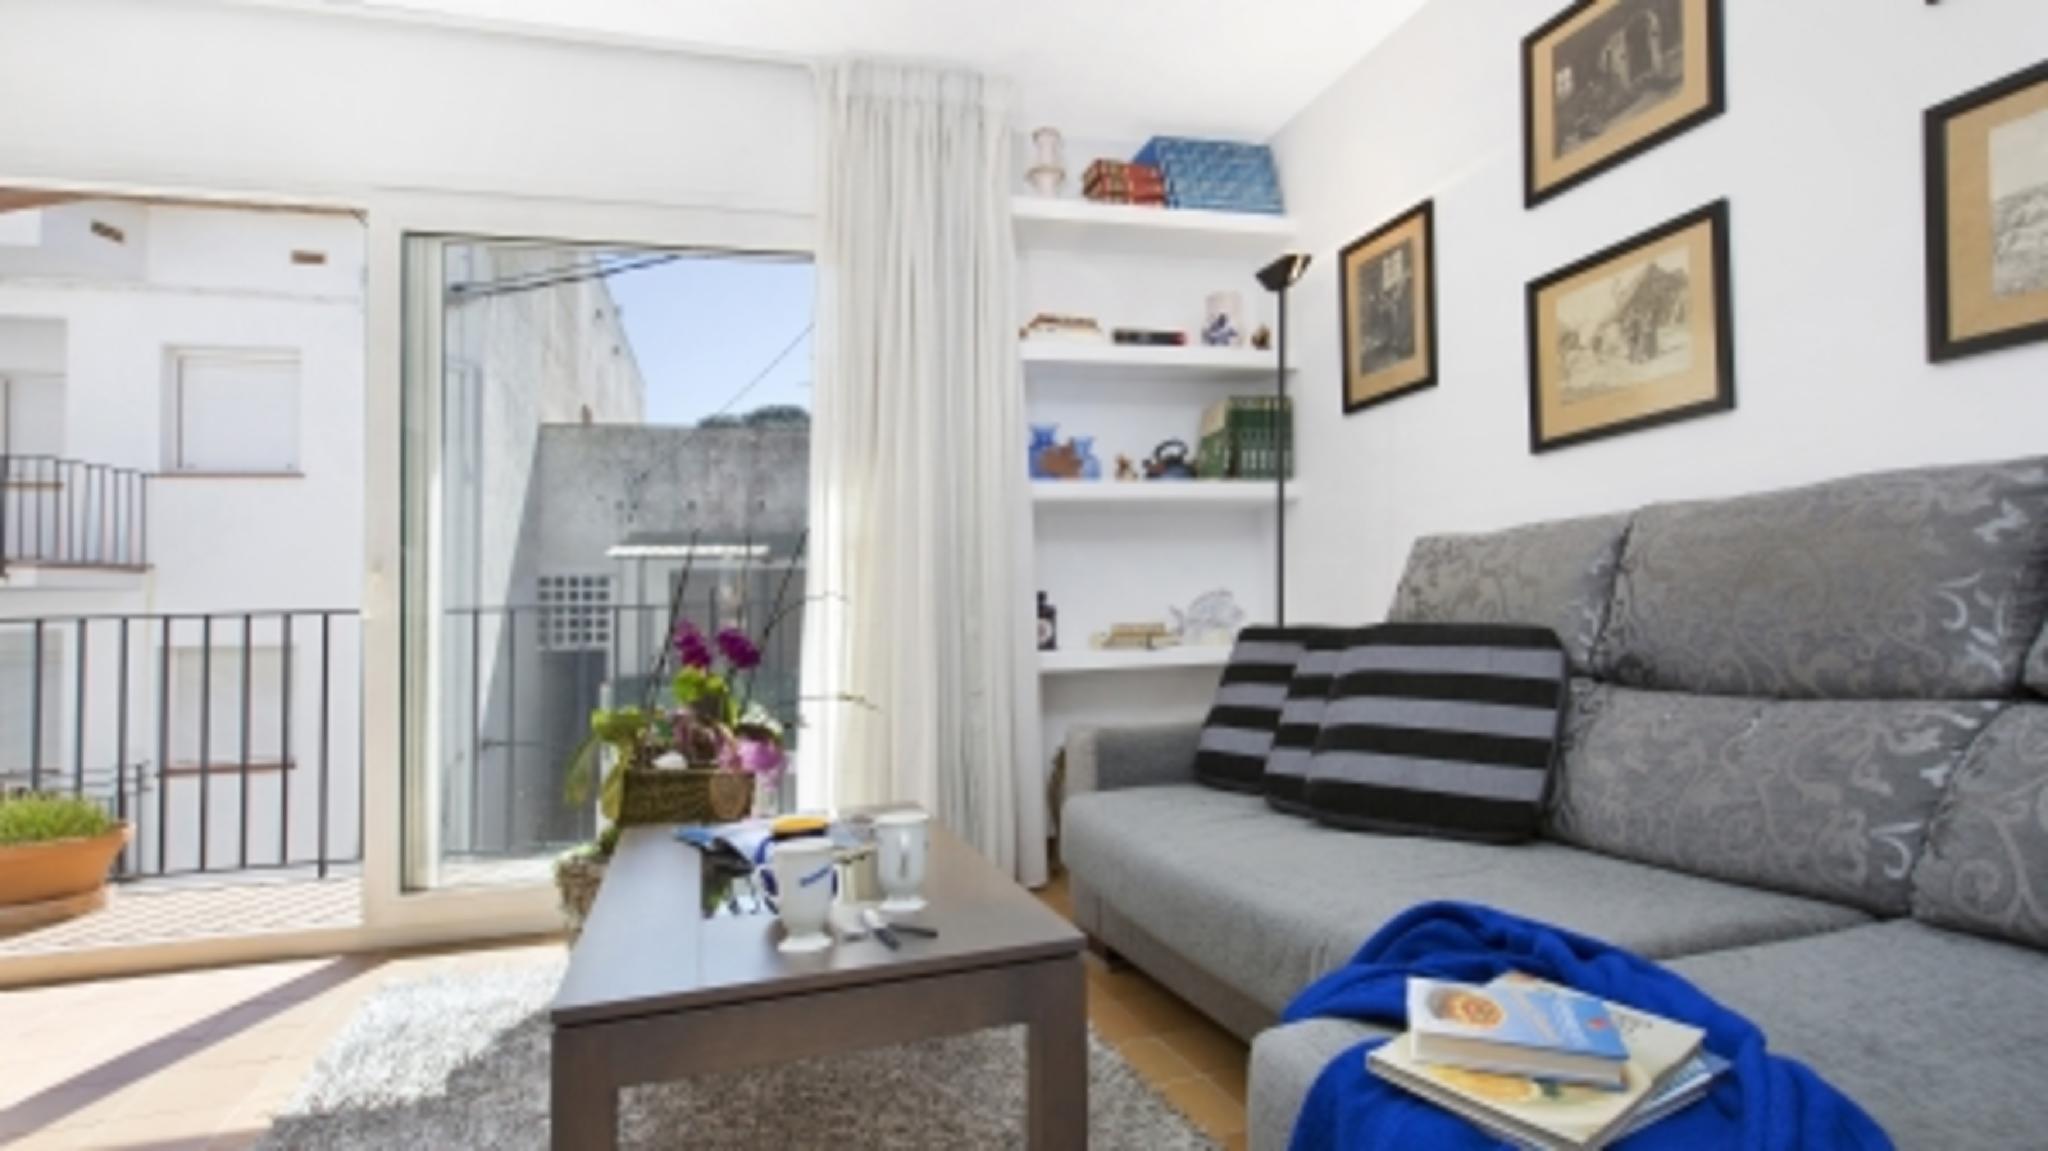 107297  Apartment In Llafranc